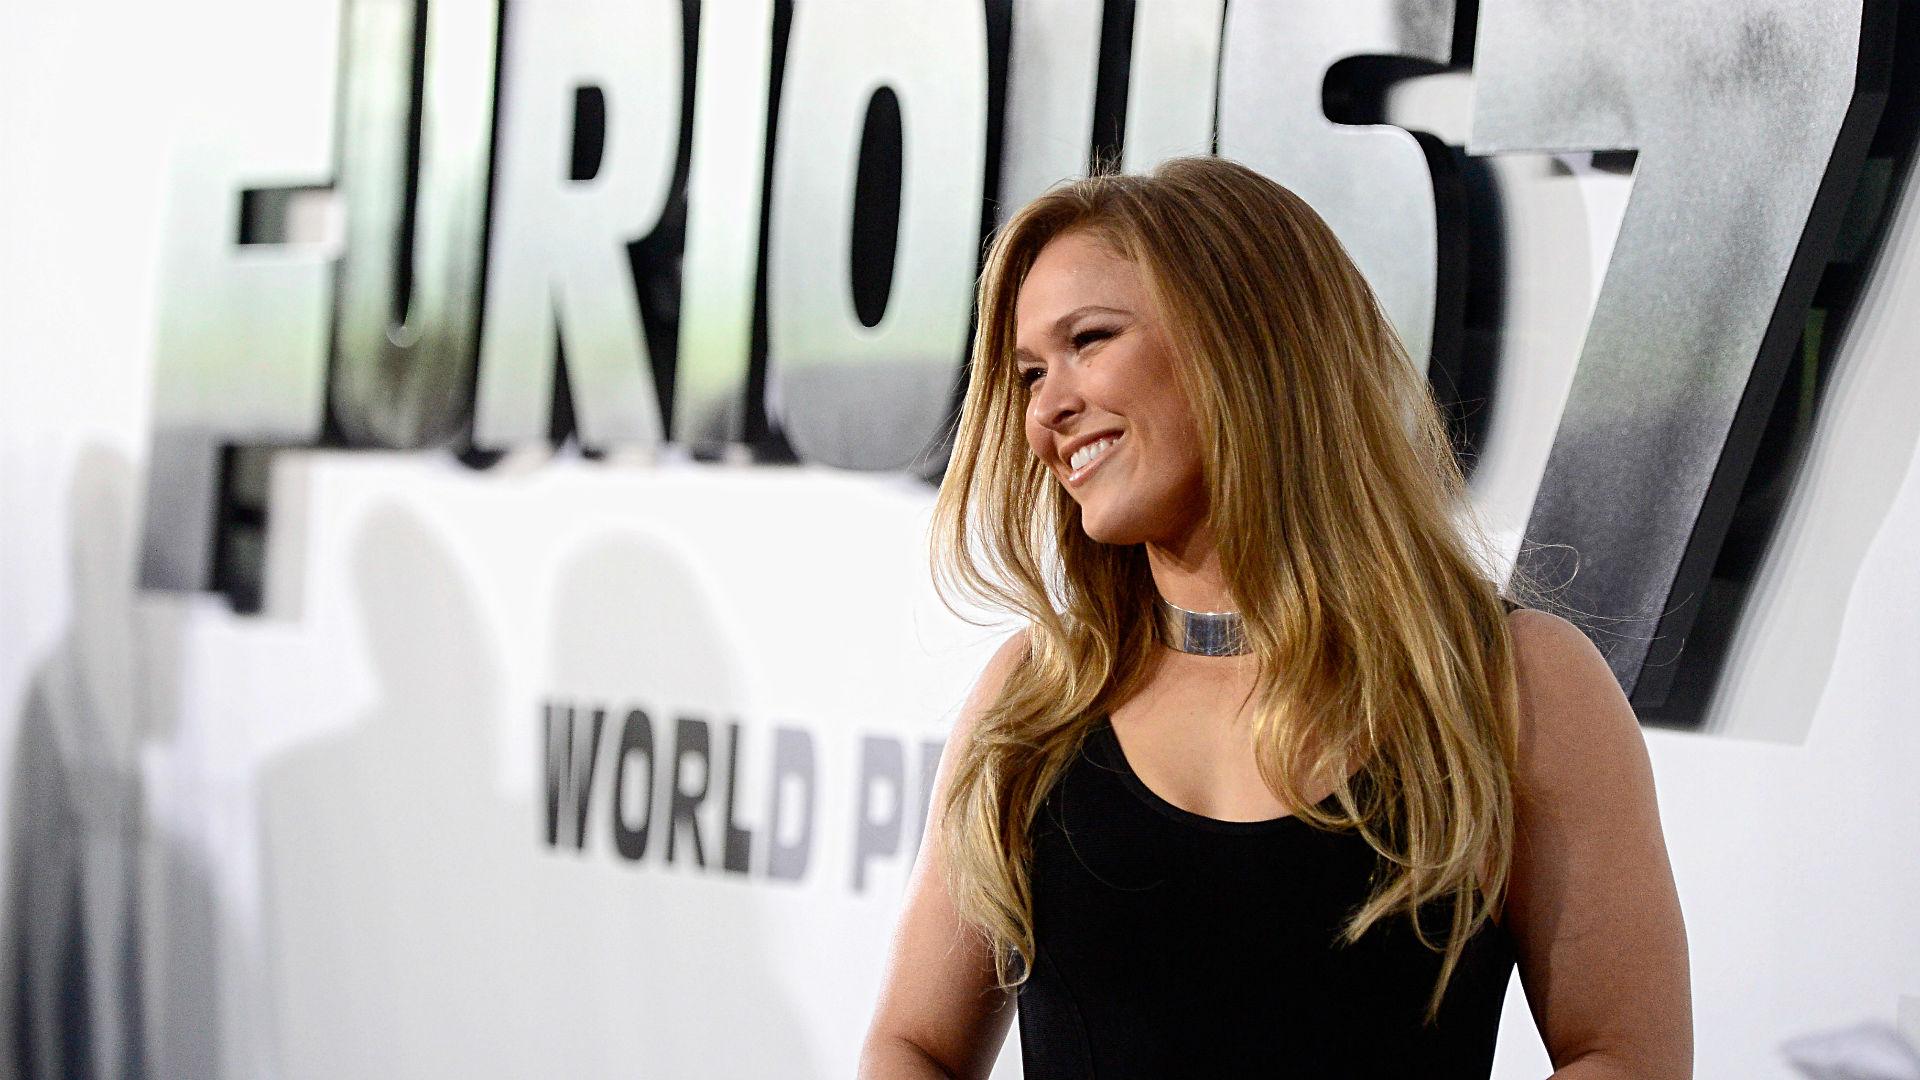 Ronda-Rousey-FF-011616-Getty-FTR.jpg